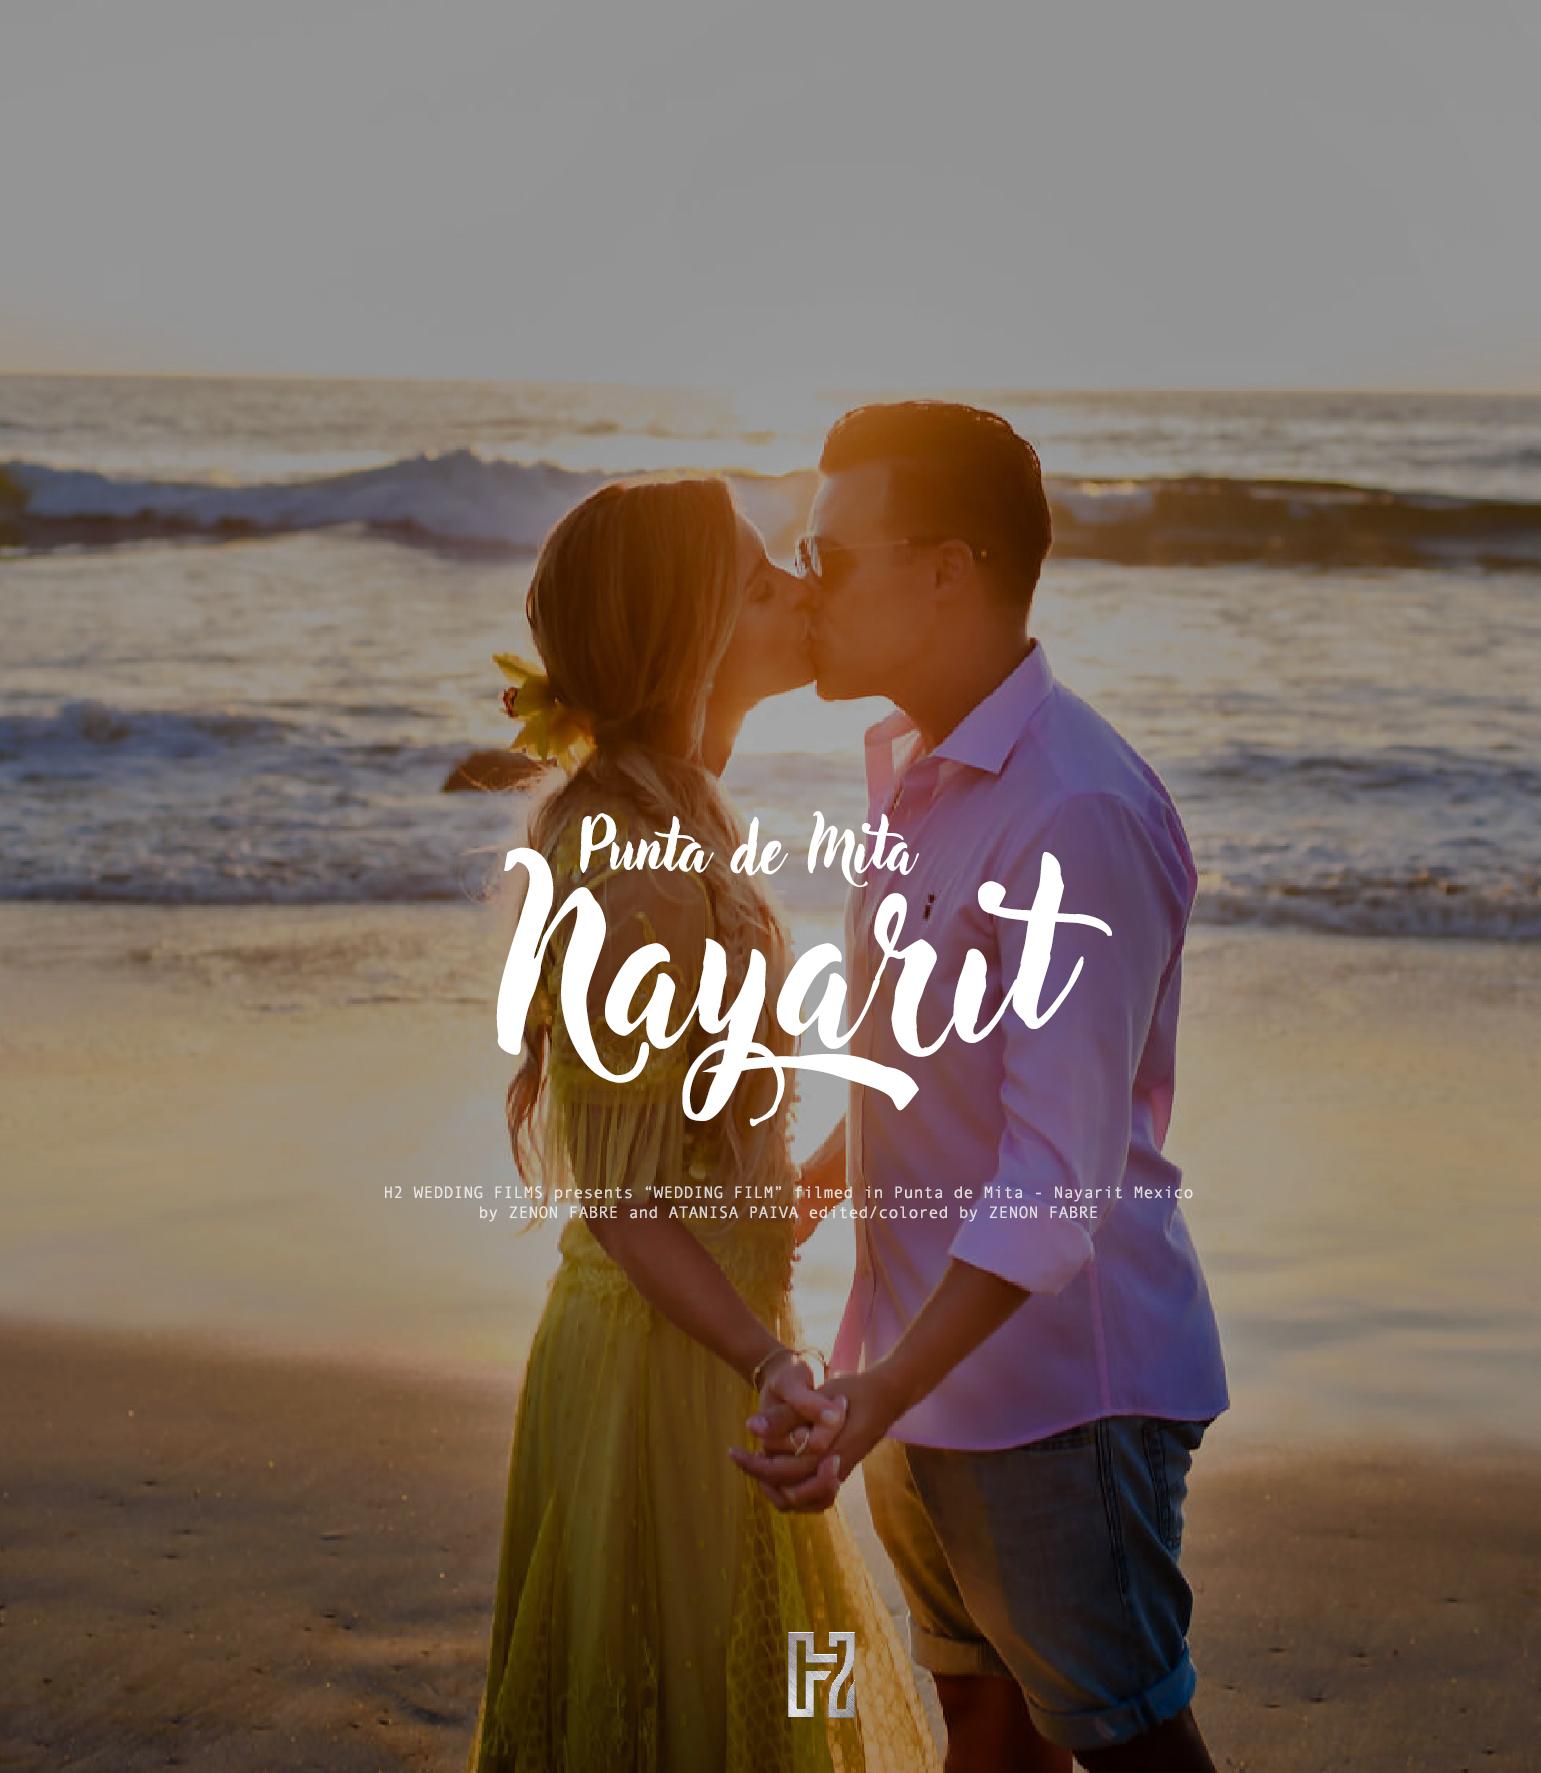 NAYARIT WeddingFamily, Love & ALOK -